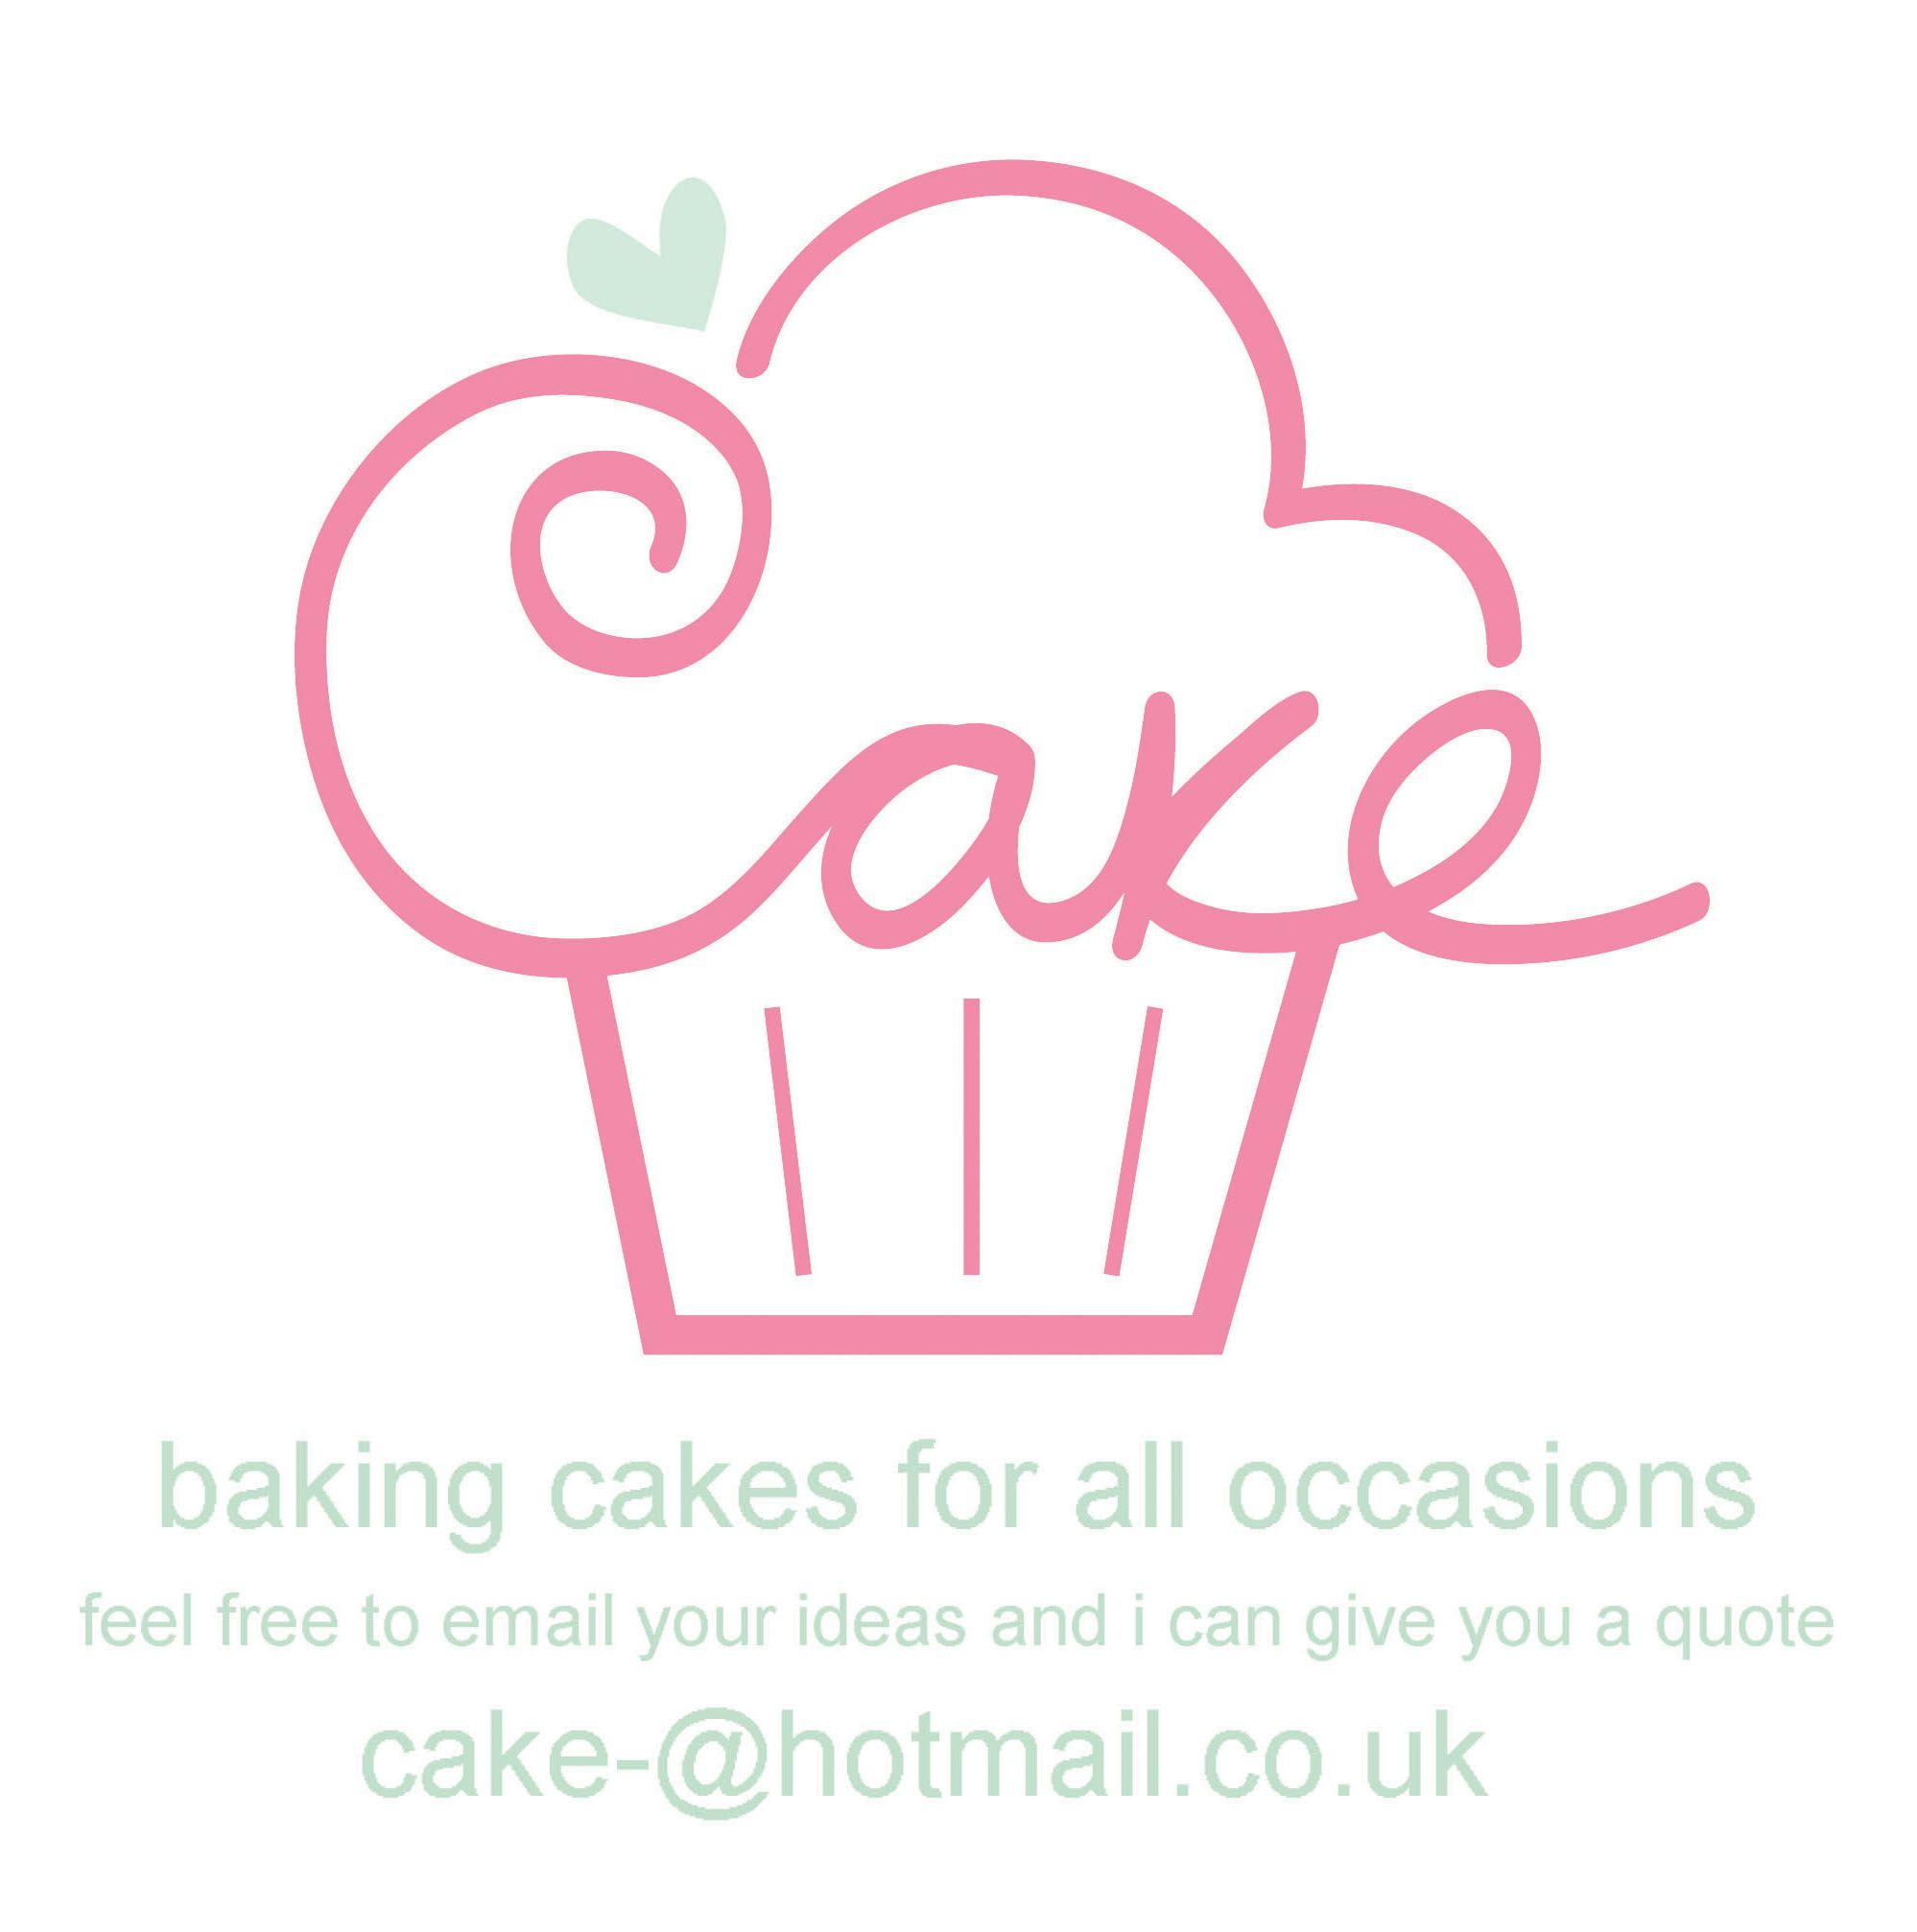 Cake Business Cards Designs